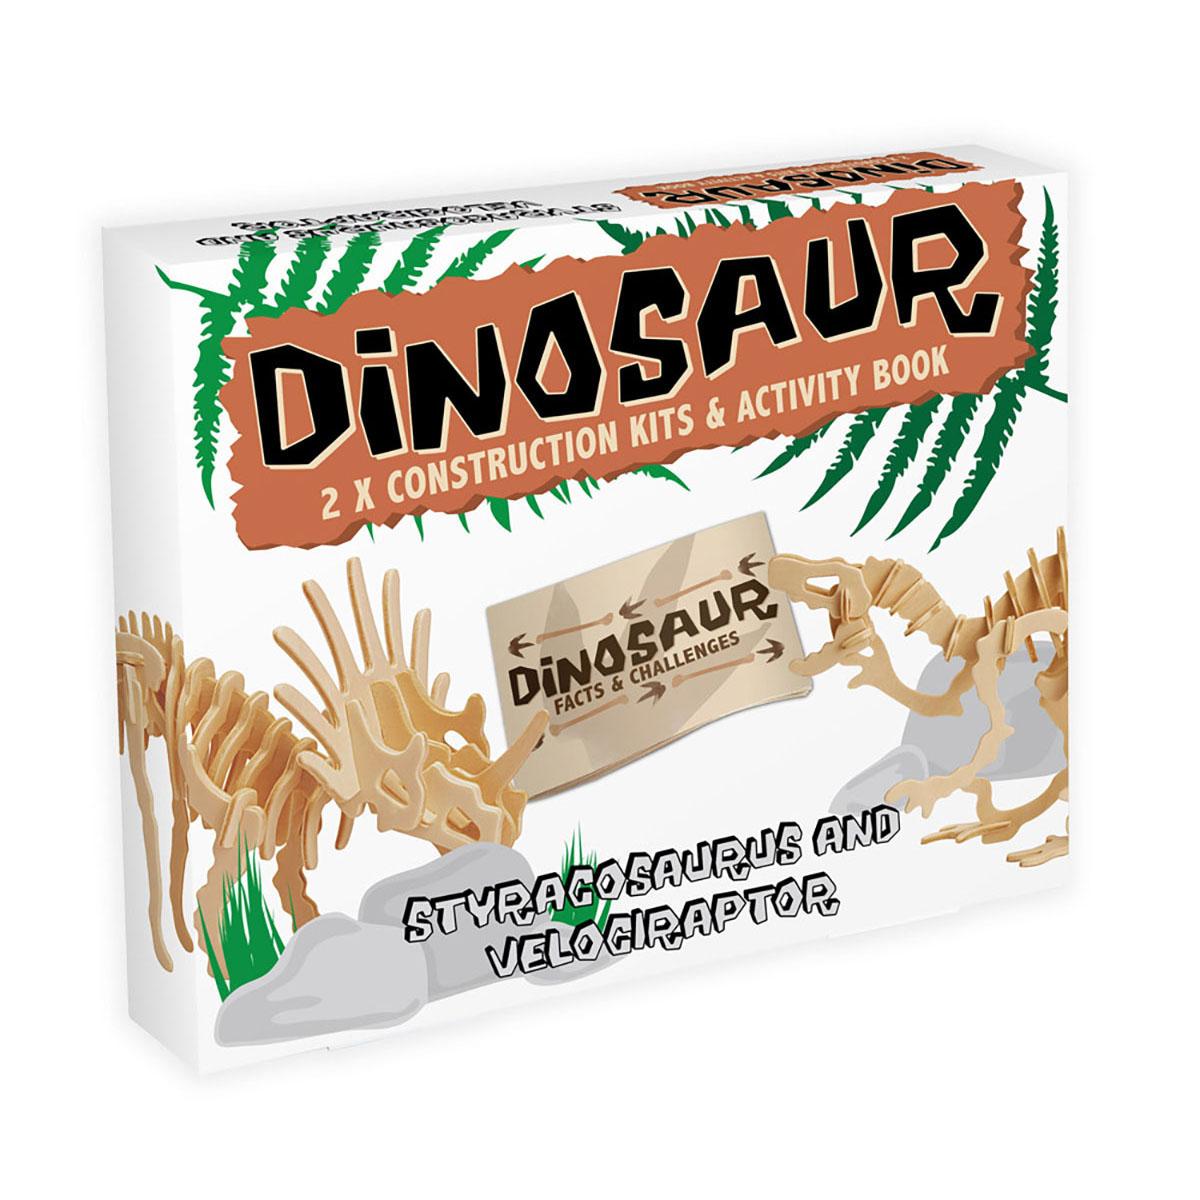 Dinosaur - Styracosaurus and Velociraptor